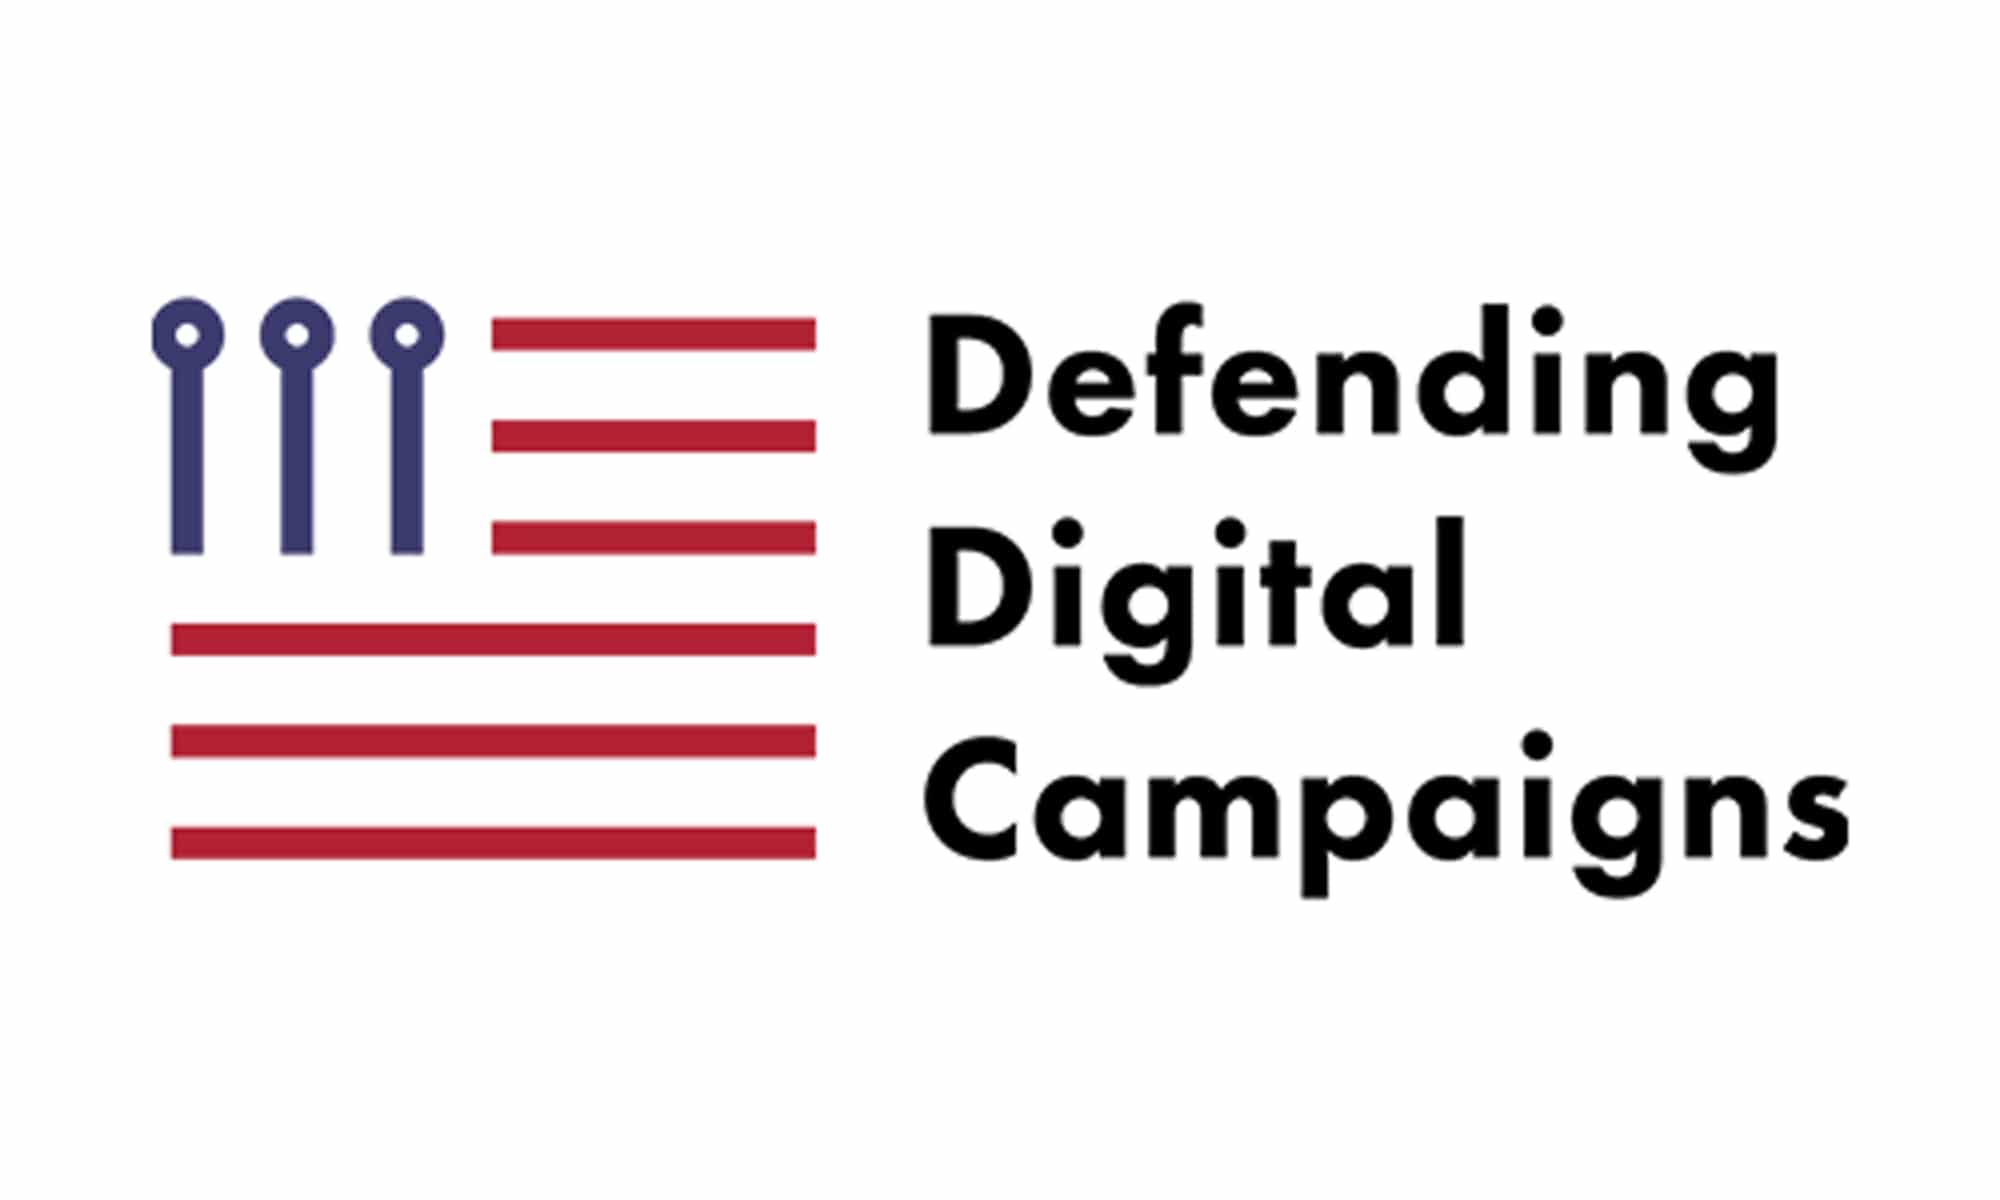 Defending Digital Campaigns